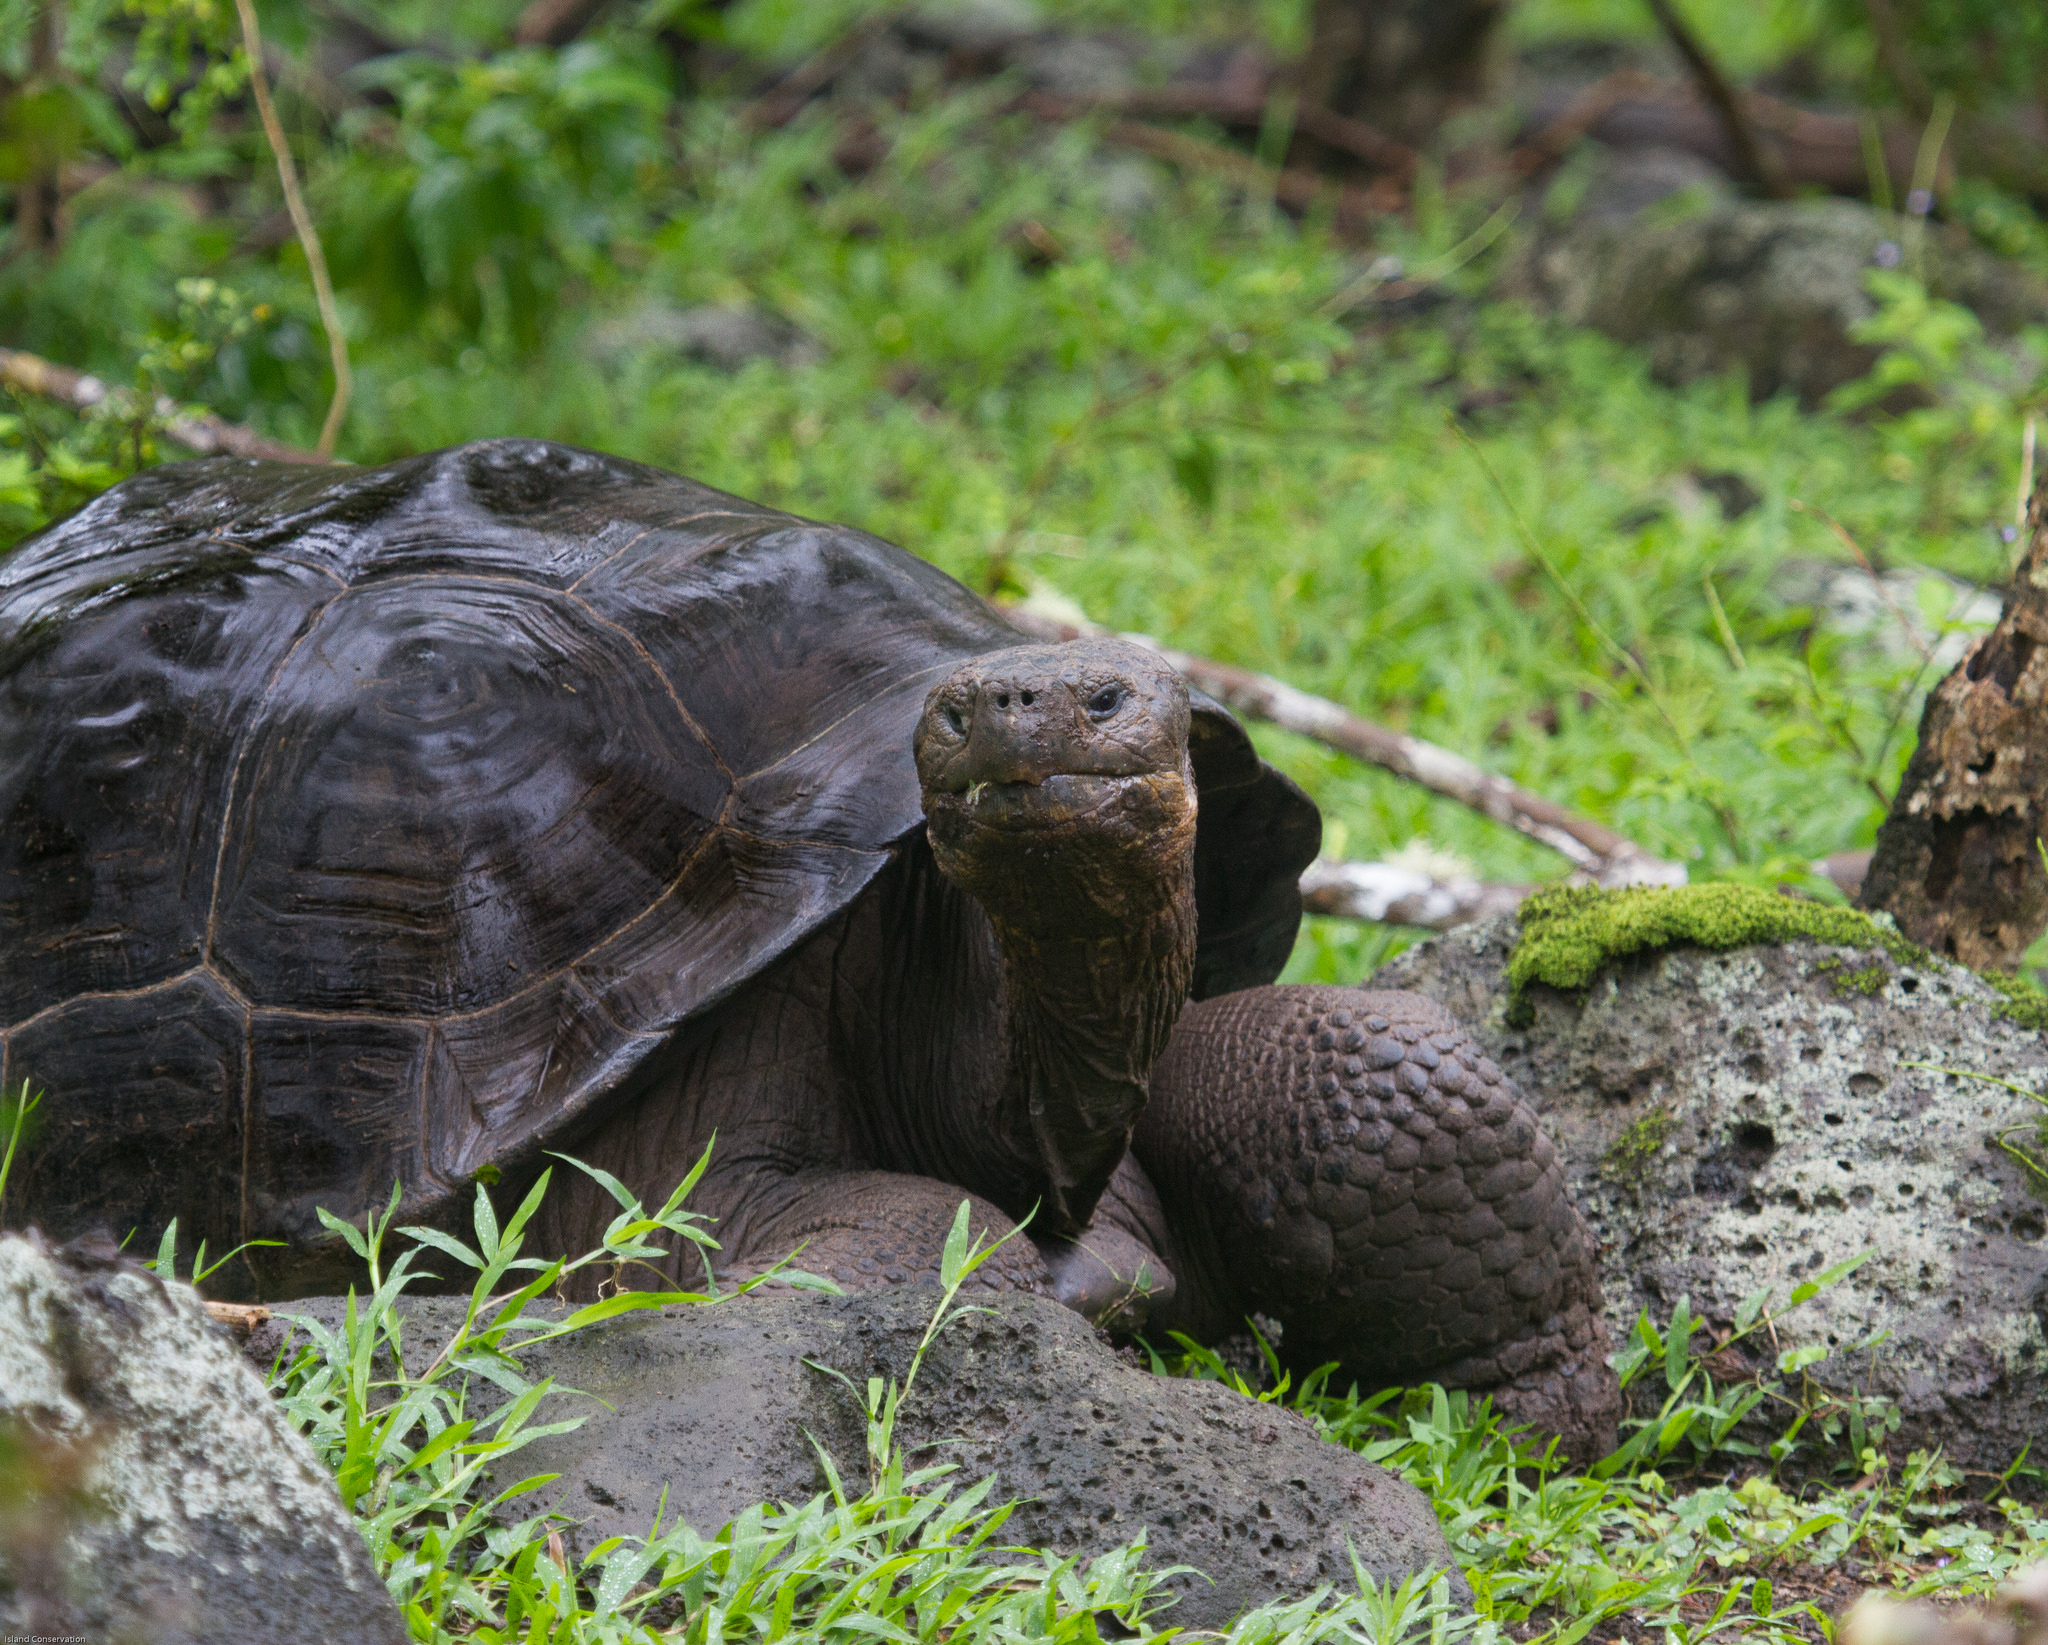 Island Conservation Floreana Tortoise